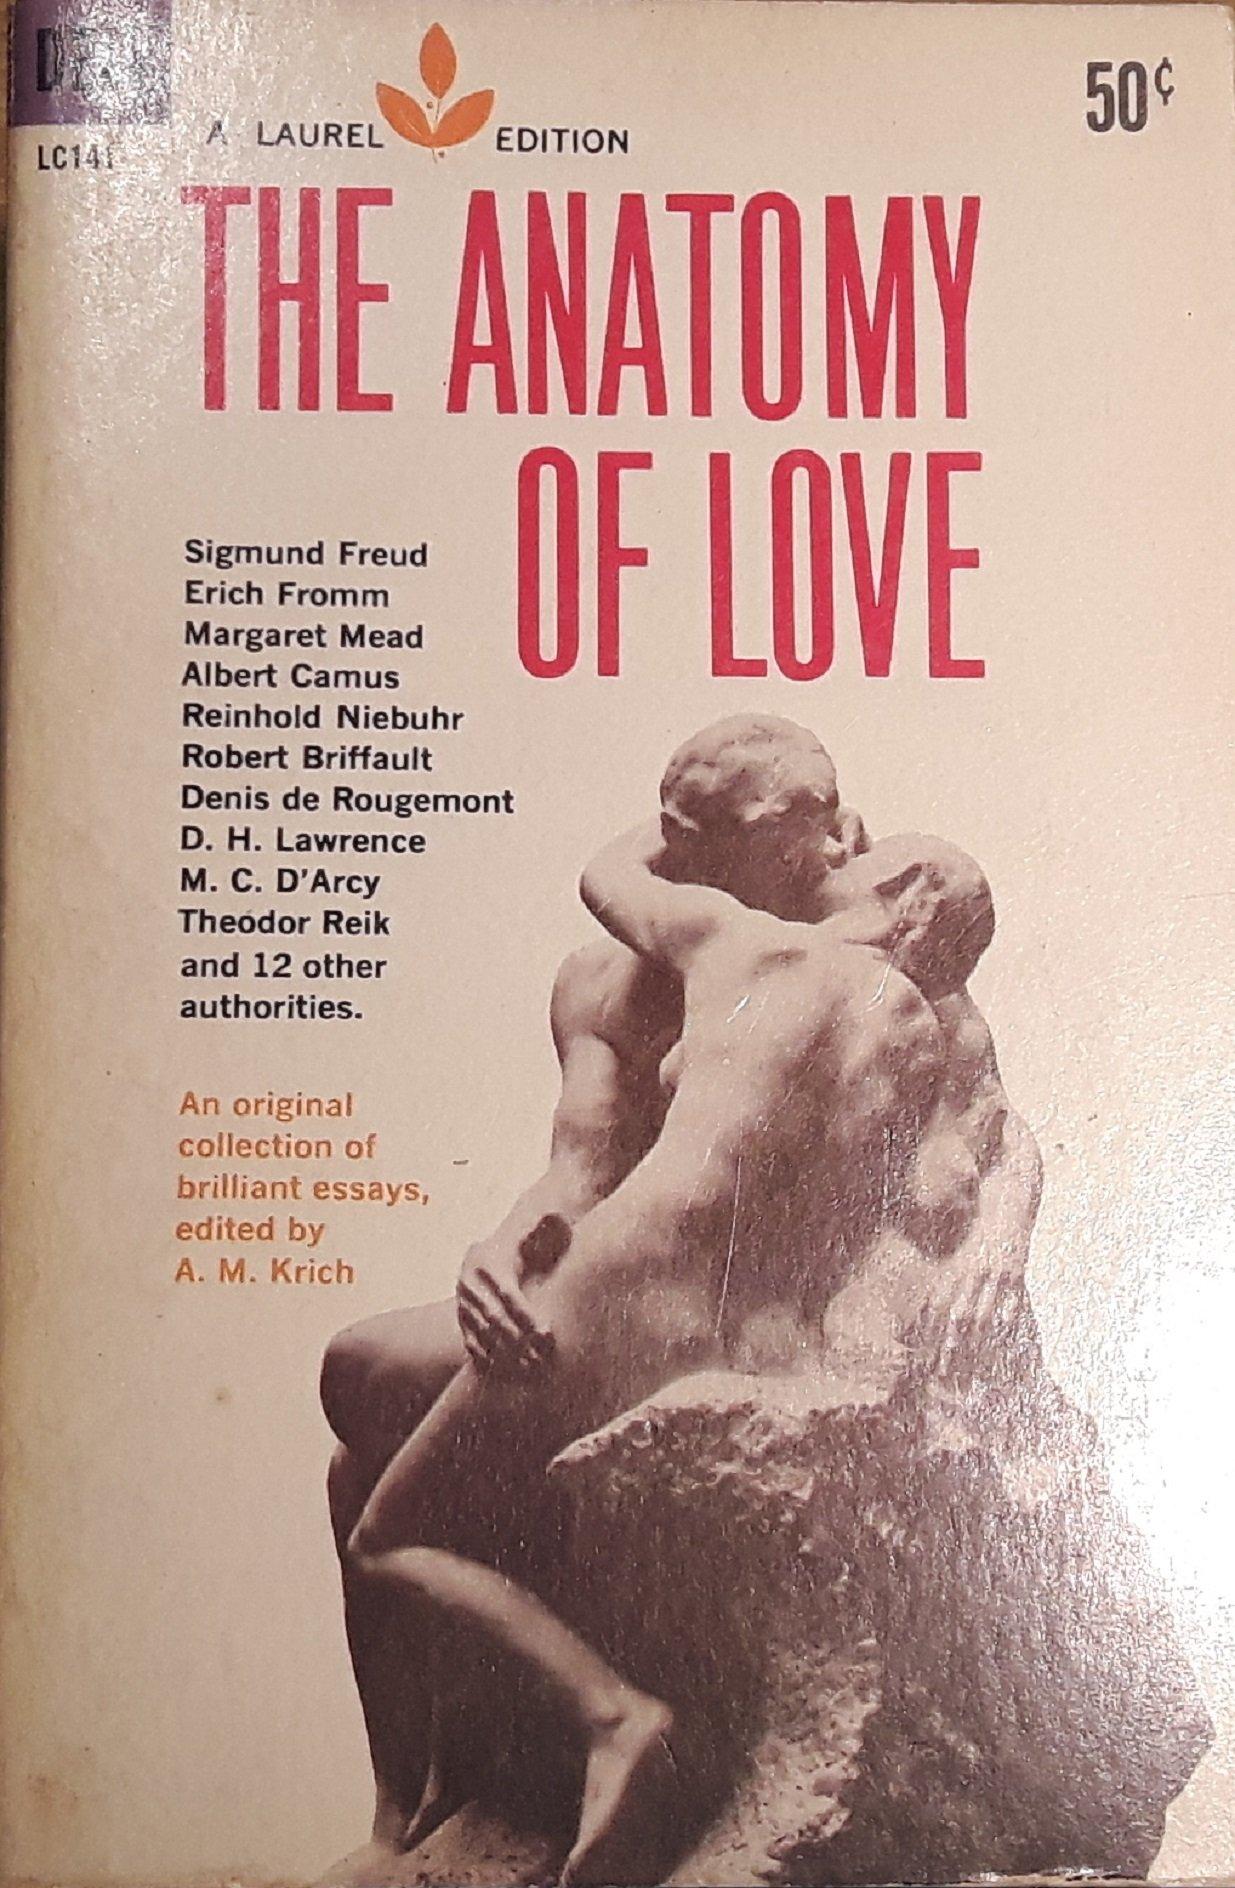 Anatomy of Love: A. M. (Editor) Kirch: Amazon.com: Books